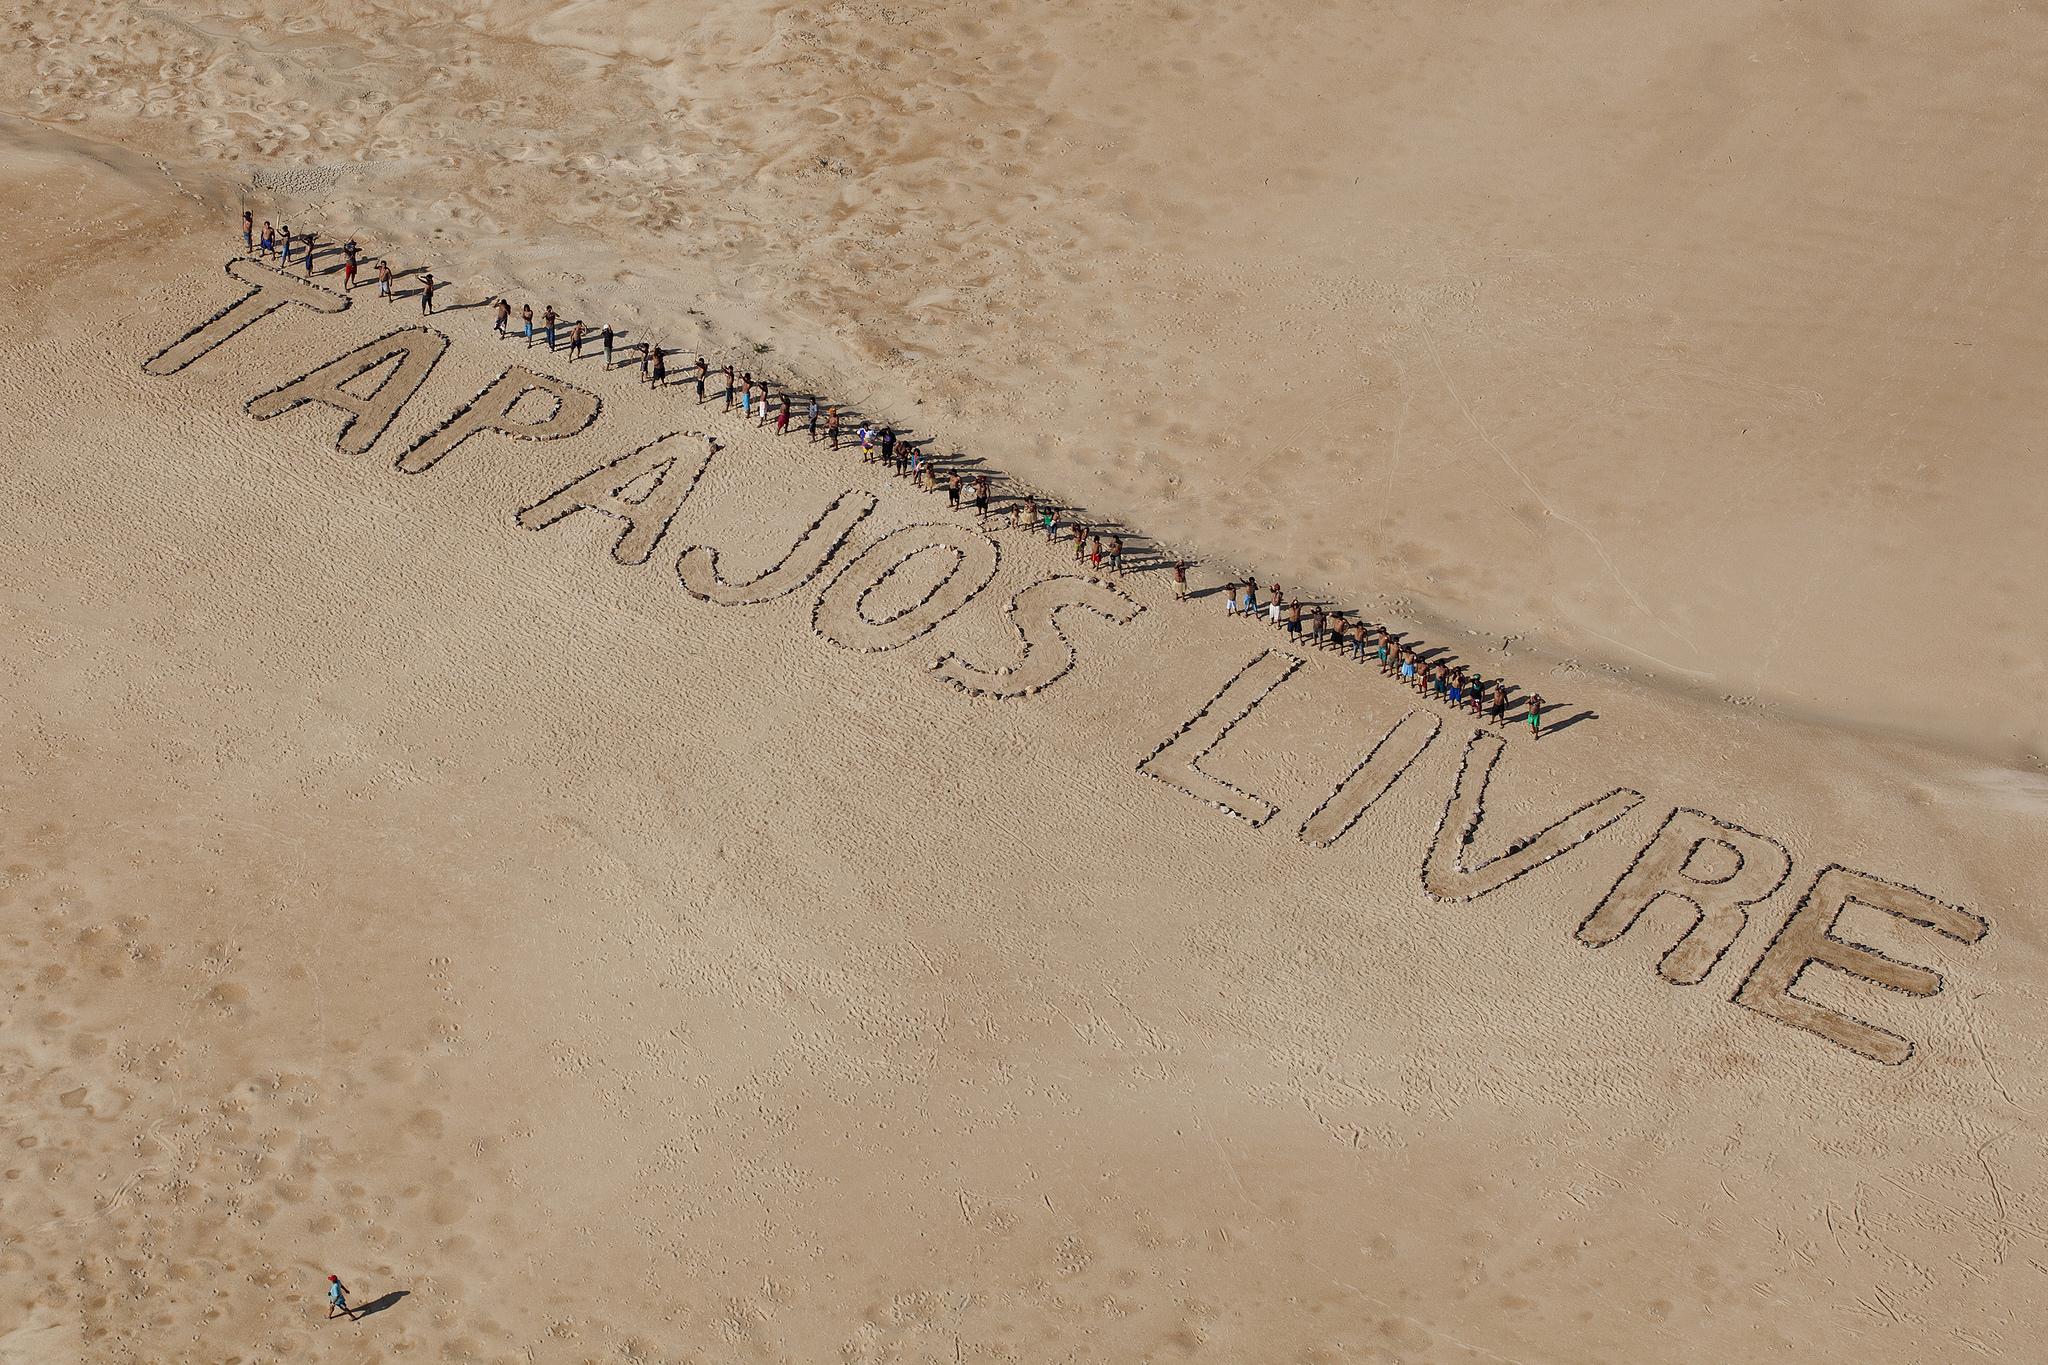 Foto: Marizilda Cruppe/Greenpeace